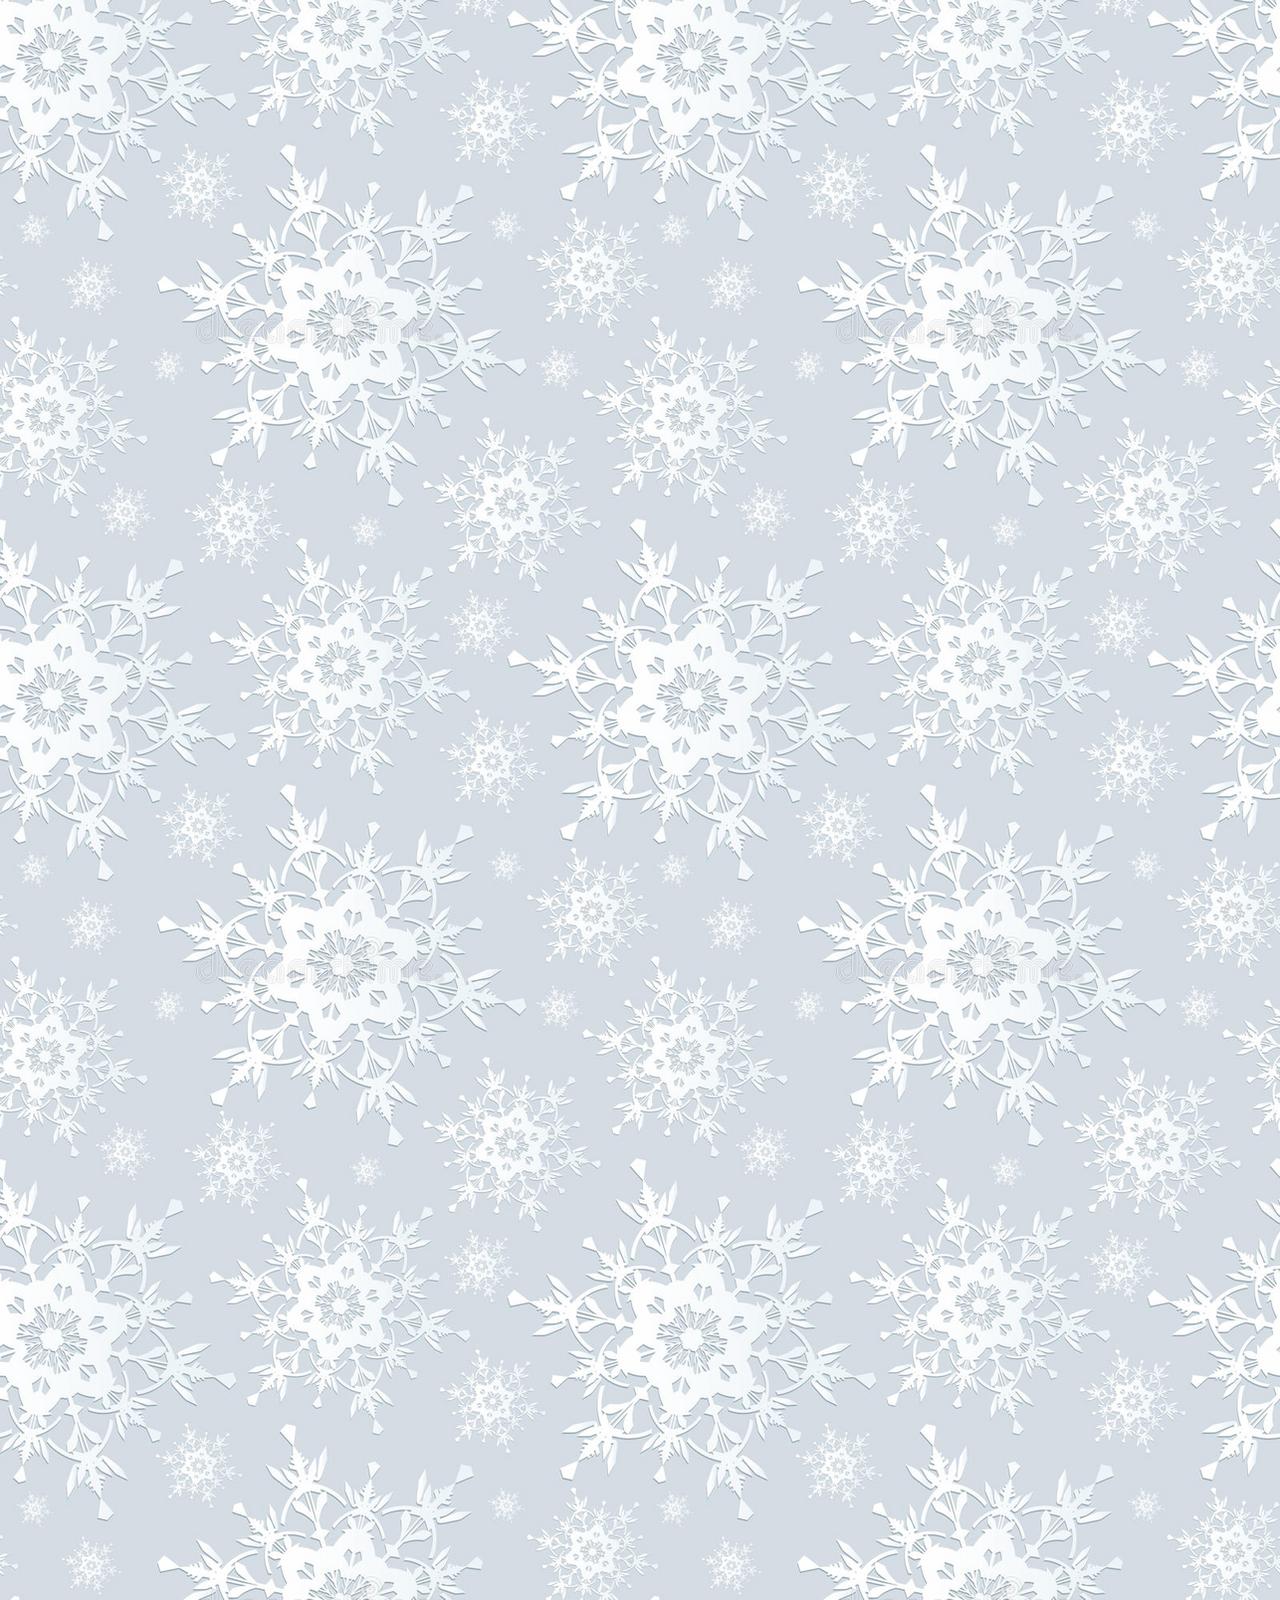 17 Wonderful HD Snowflakes Wallpapers |White Snowflake Wallpaper